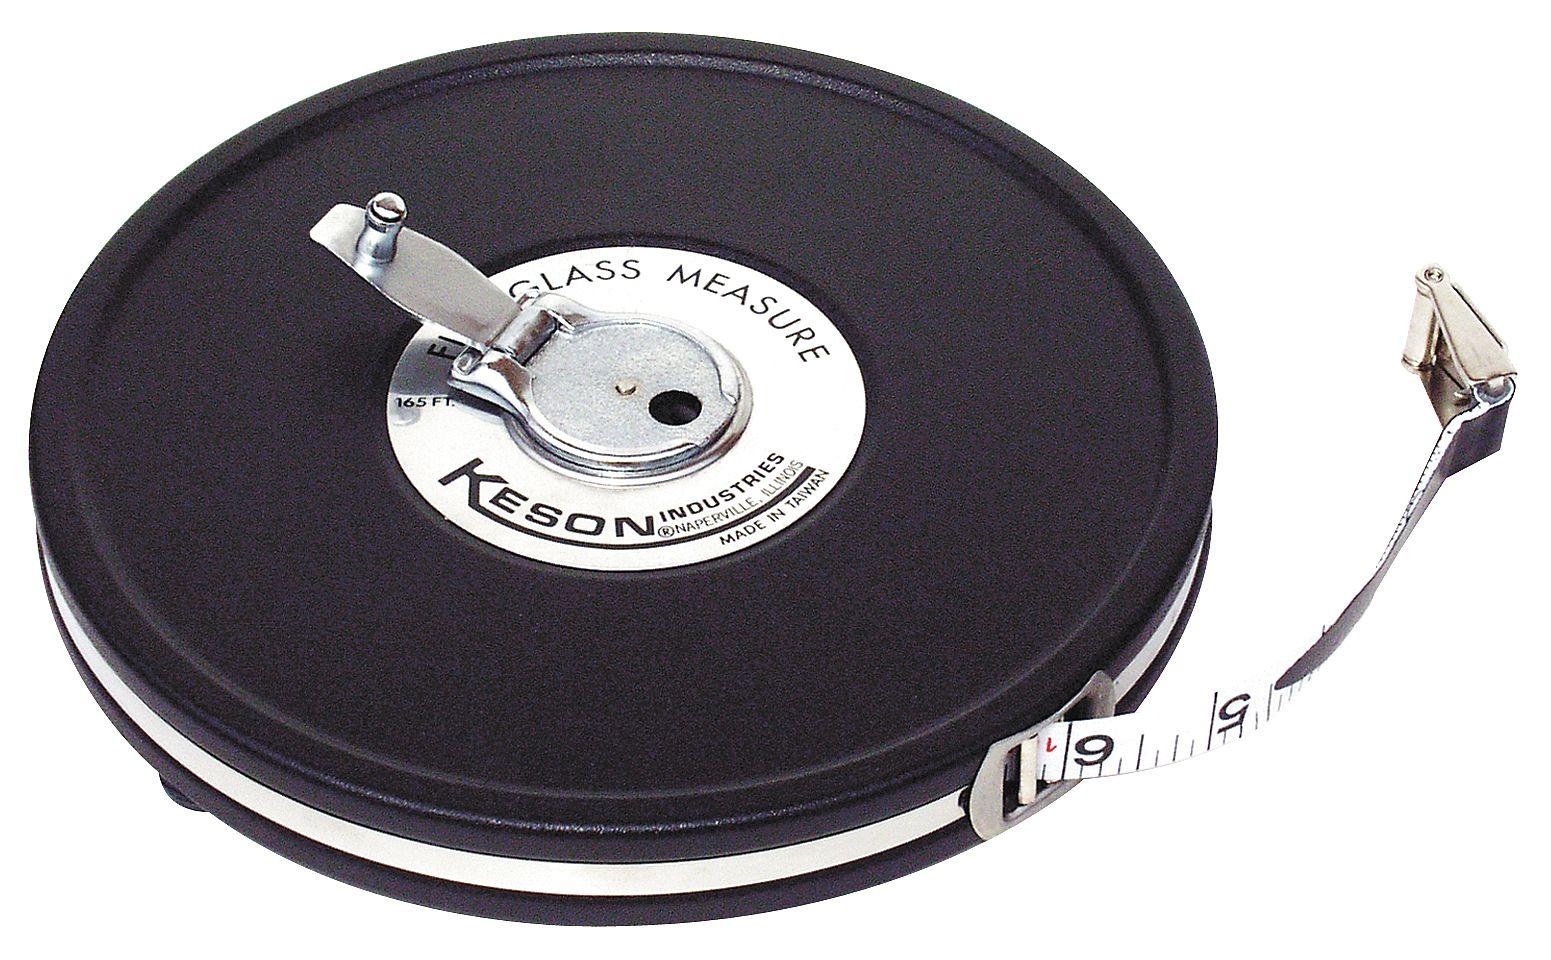 Keson - OTR-100M - Long Tape Measure, 1/2 In x 100m, Pumpkin at Sears.com